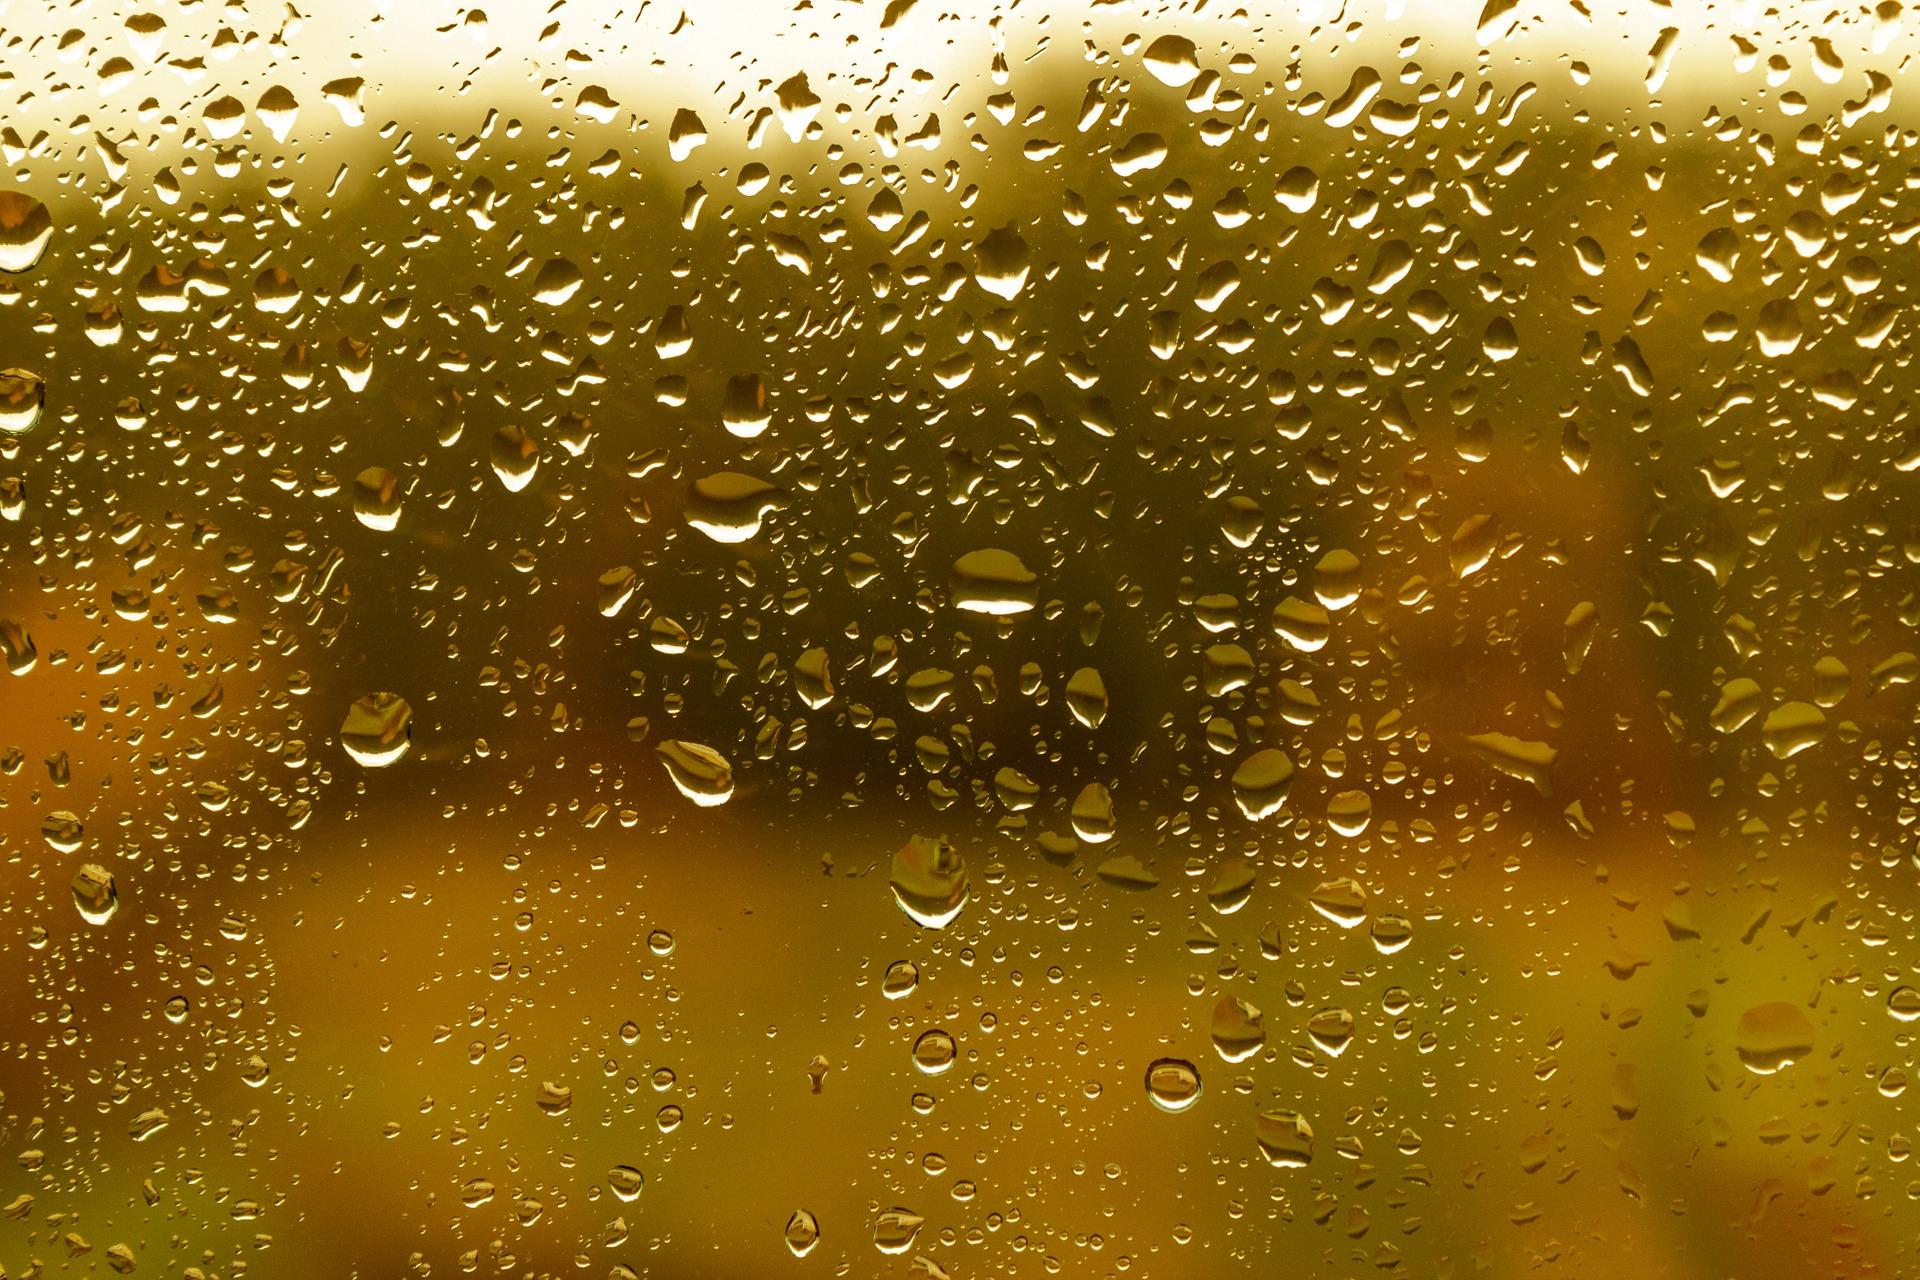 rain-3770216_1920